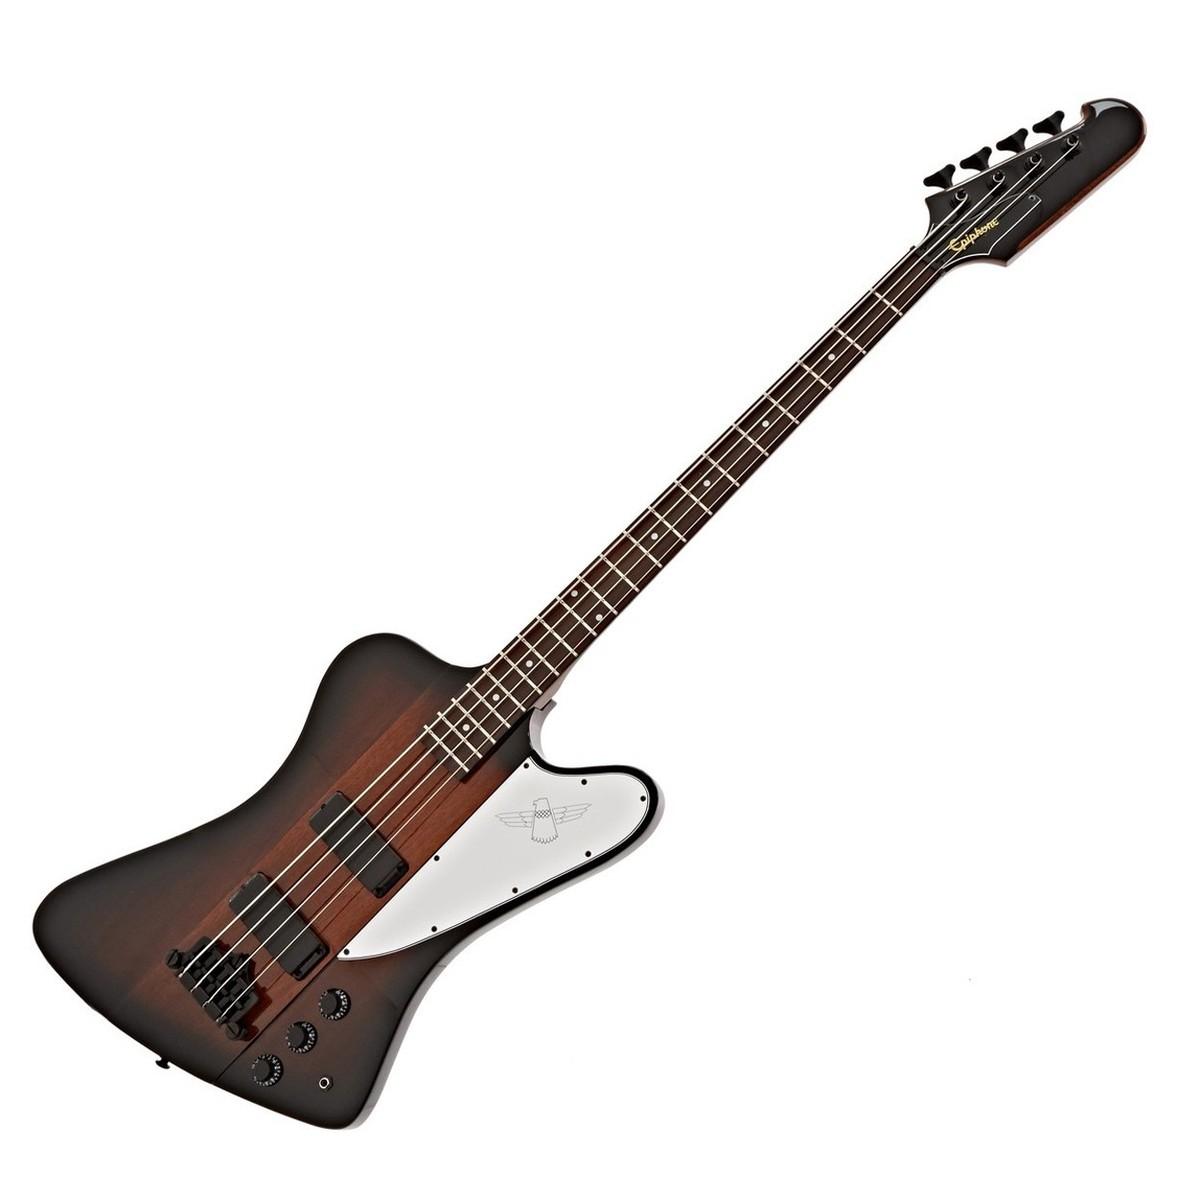 epiphone thunderbird iv bass guitar box opened at gear4music. Black Bedroom Furniture Sets. Home Design Ideas